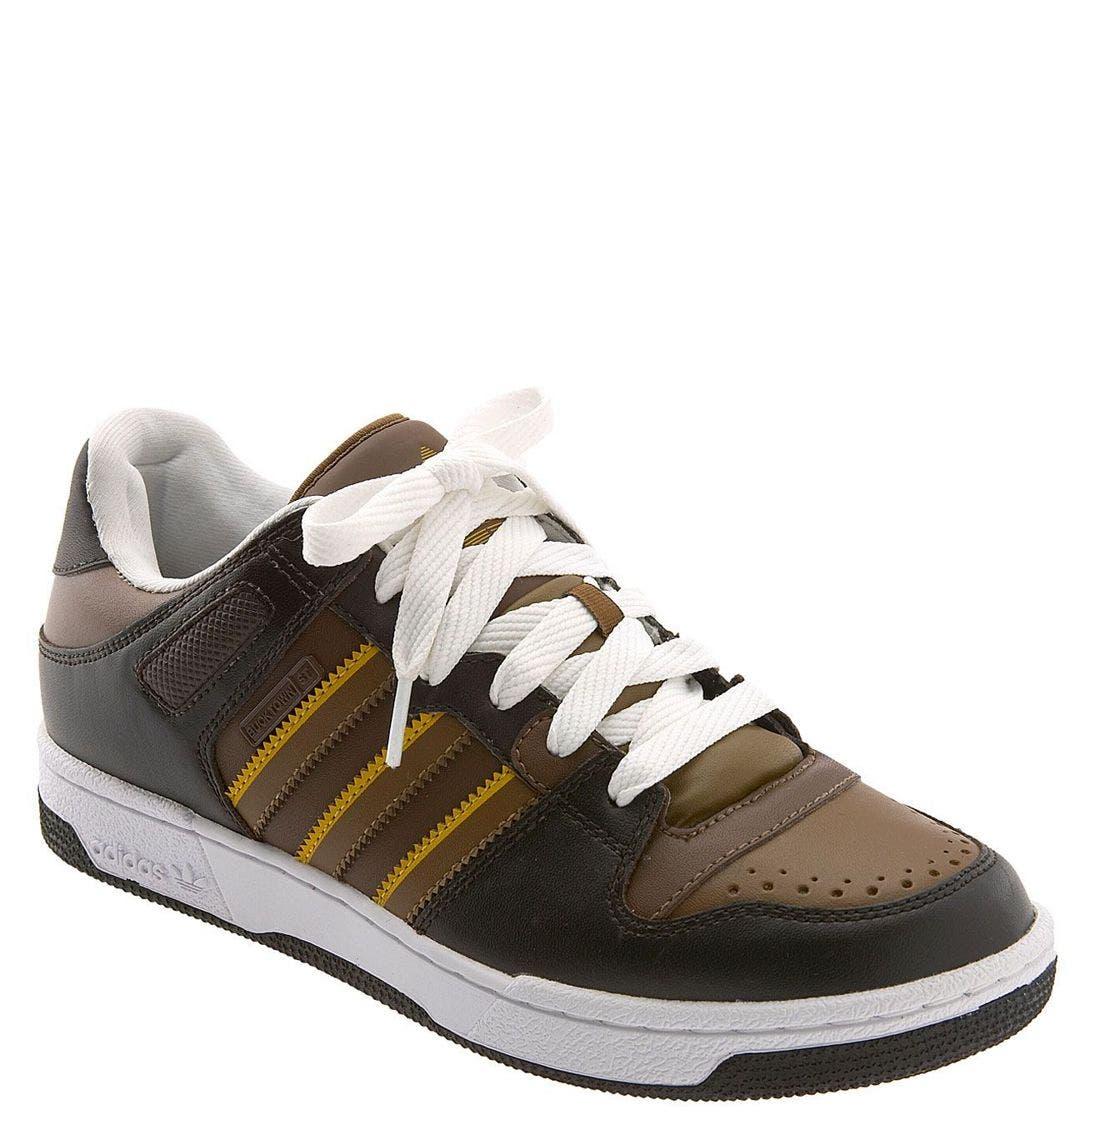 'Bucktown ST' Athletic Shoe,                             Main thumbnail 1, color,                             QLG